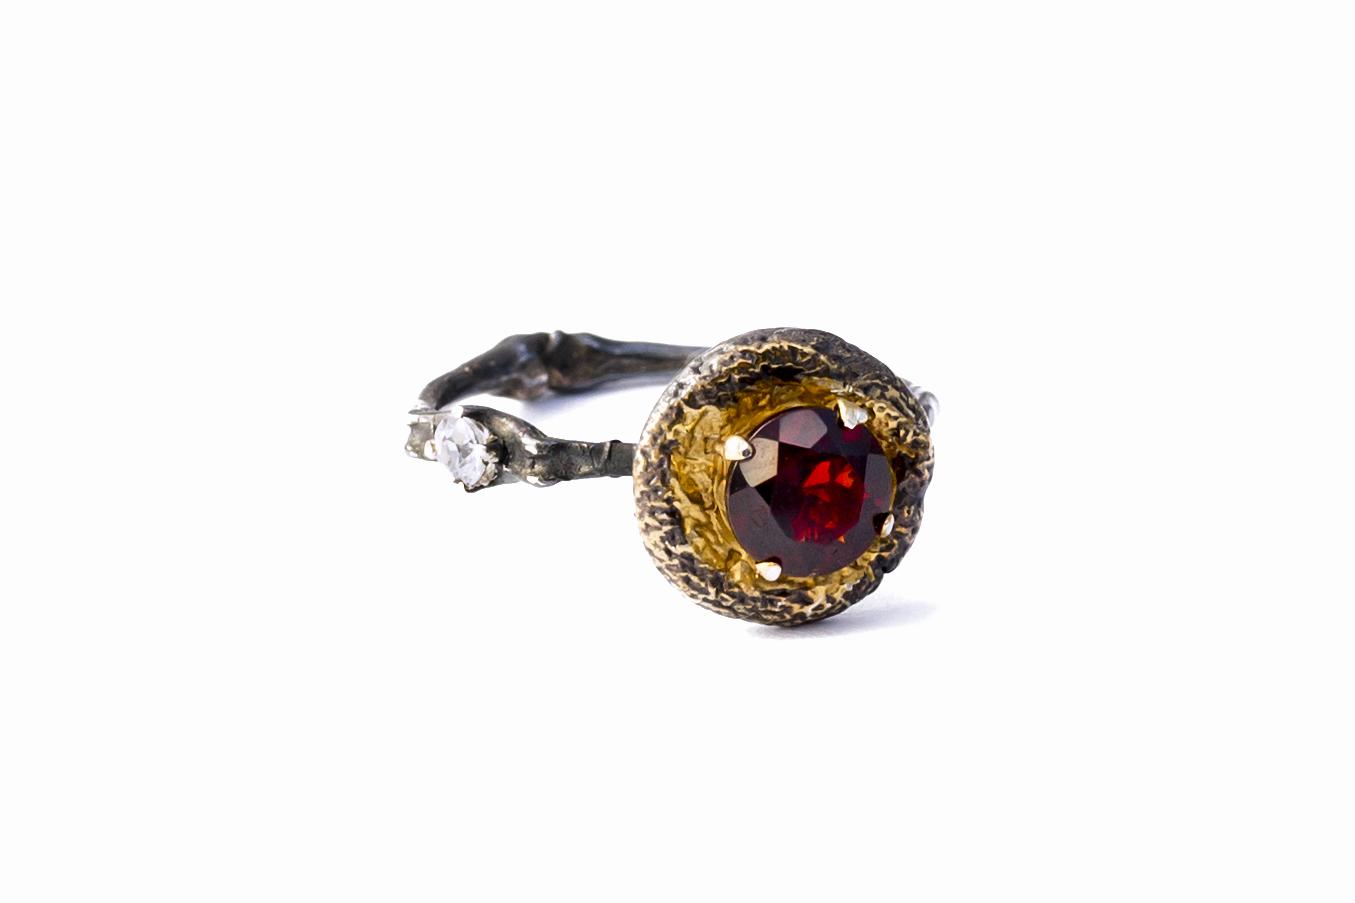 Luke Maninov Neuroscience jewelry jewellery surfacing vesicle ring